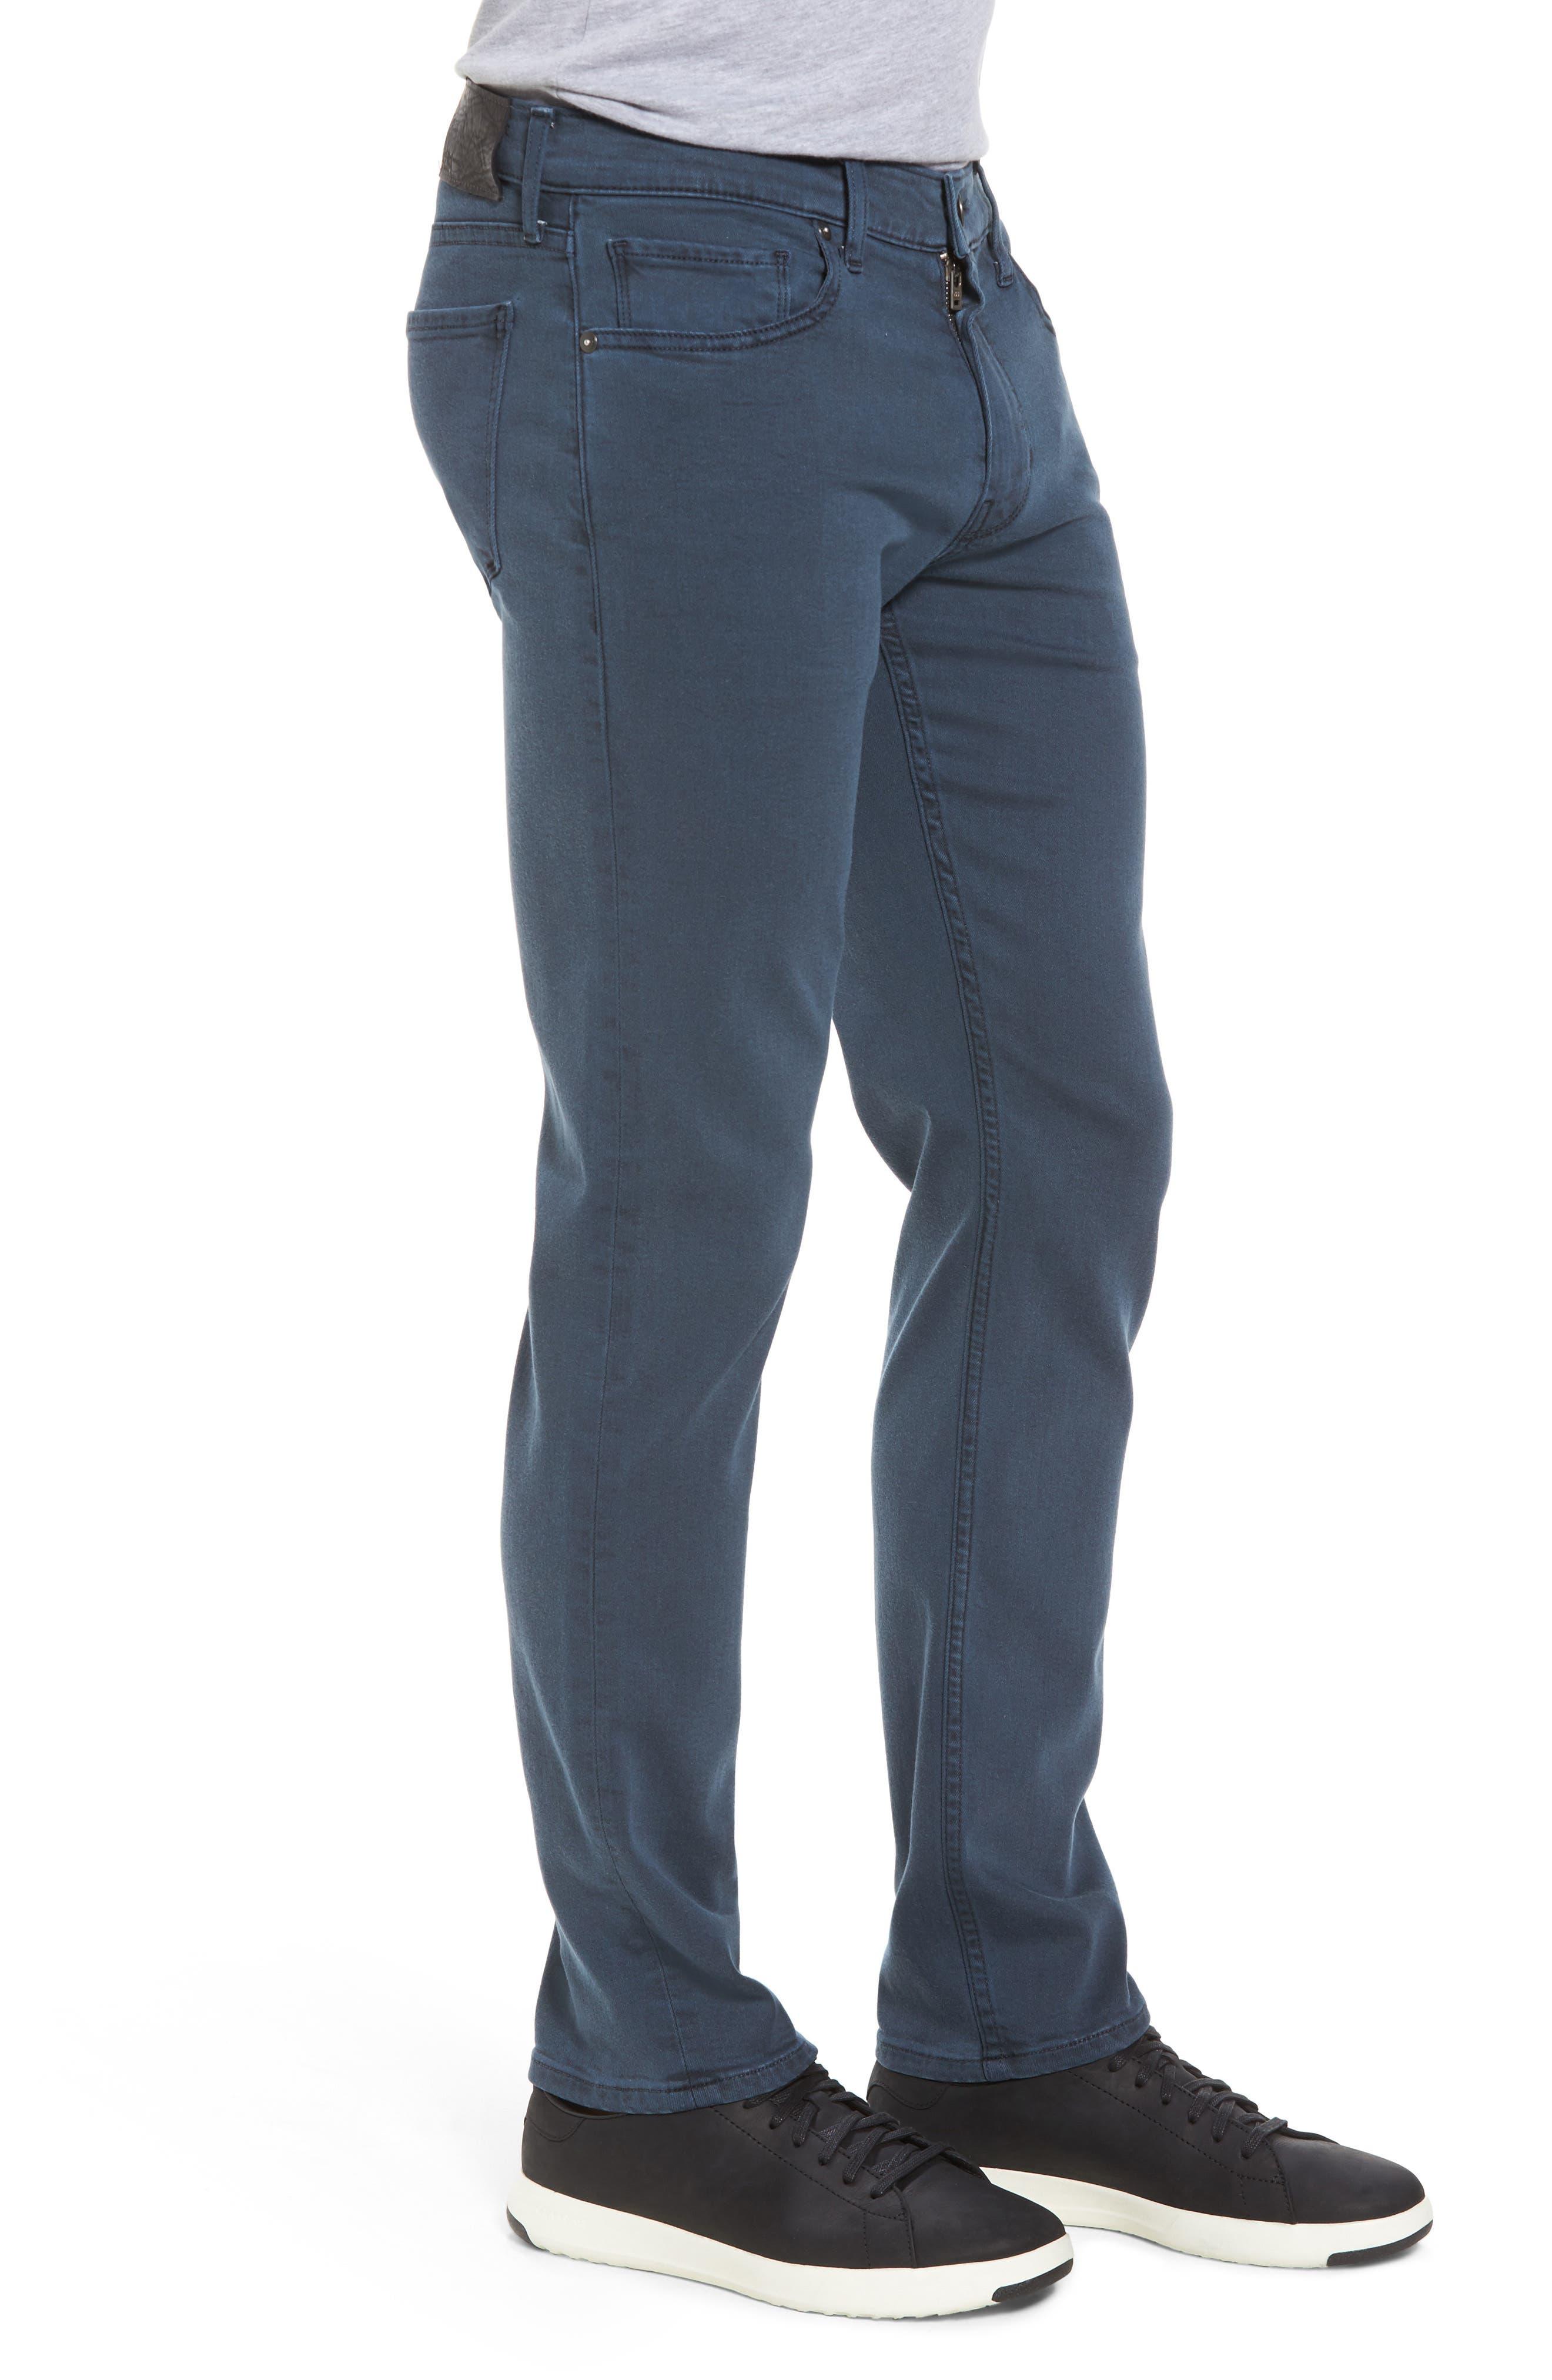 Lennox Slim Fit Jeans,                             Alternate thumbnail 3, color,                             Vintage Amalfi